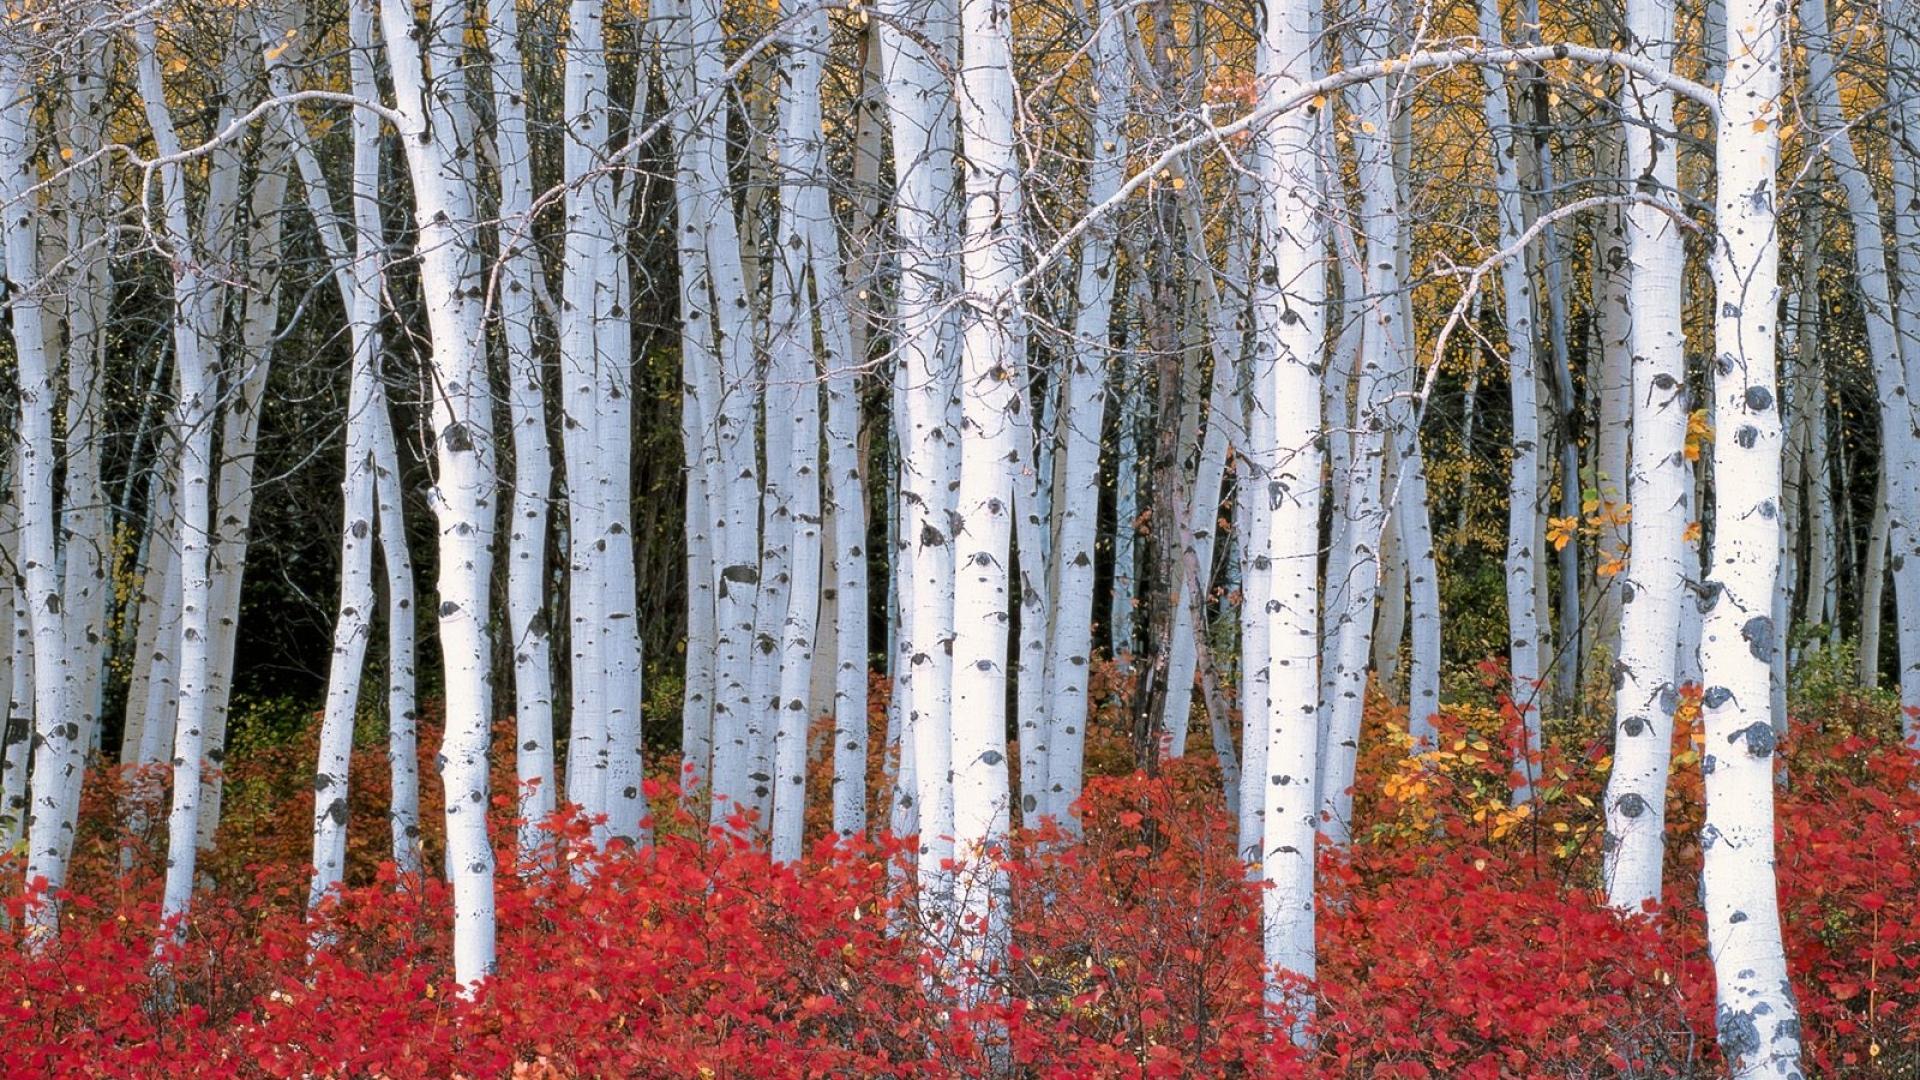 Birch Tree 6836840 1920x1080